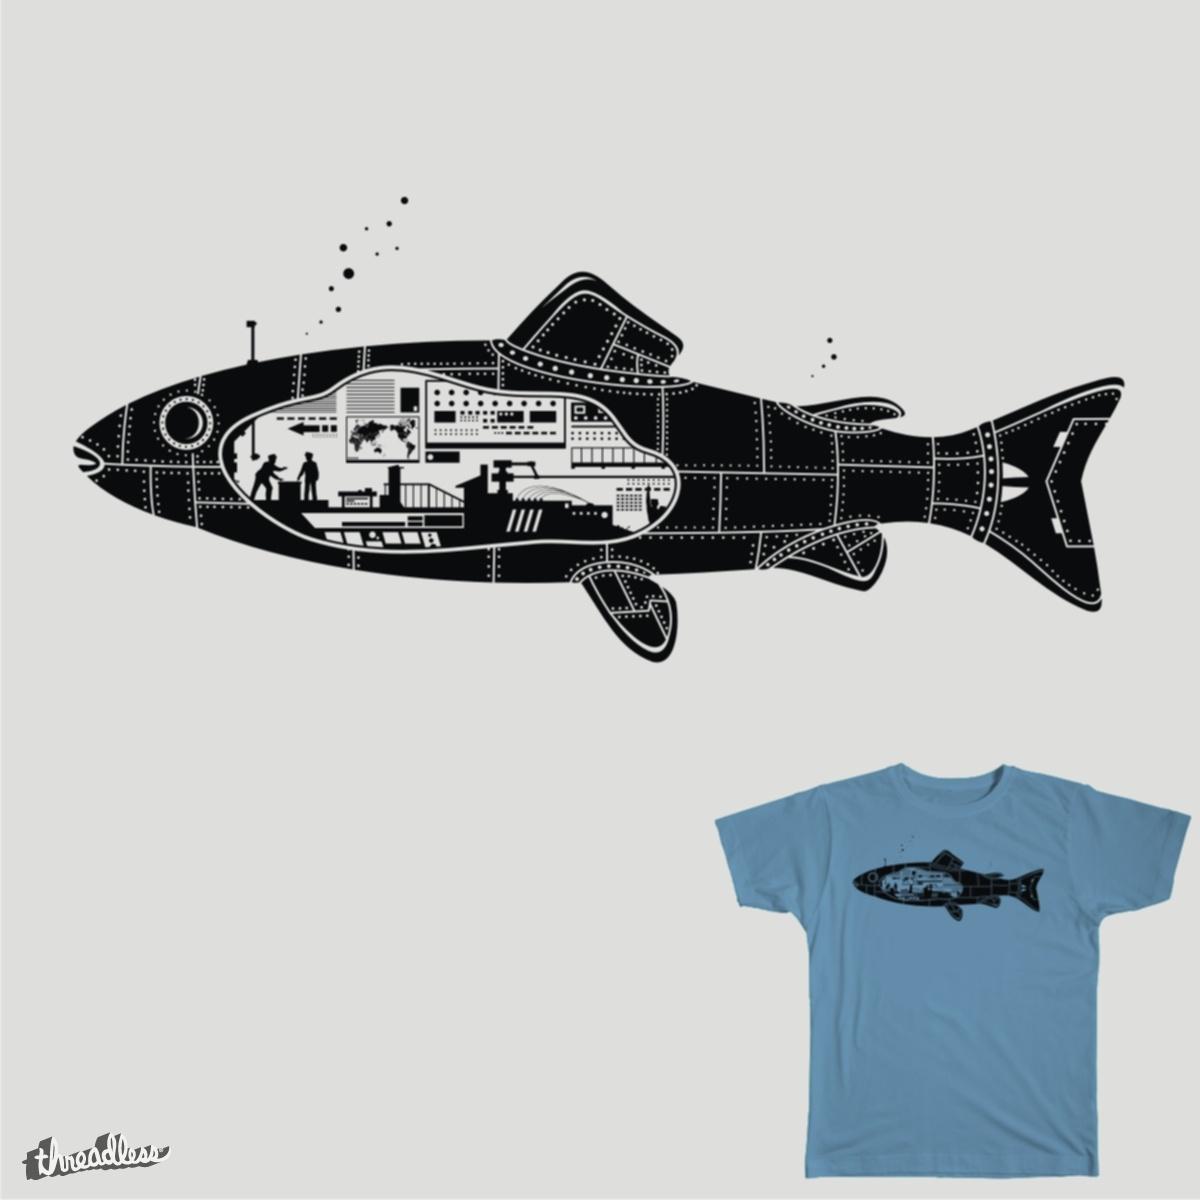 fishmarin by skian on Threadless